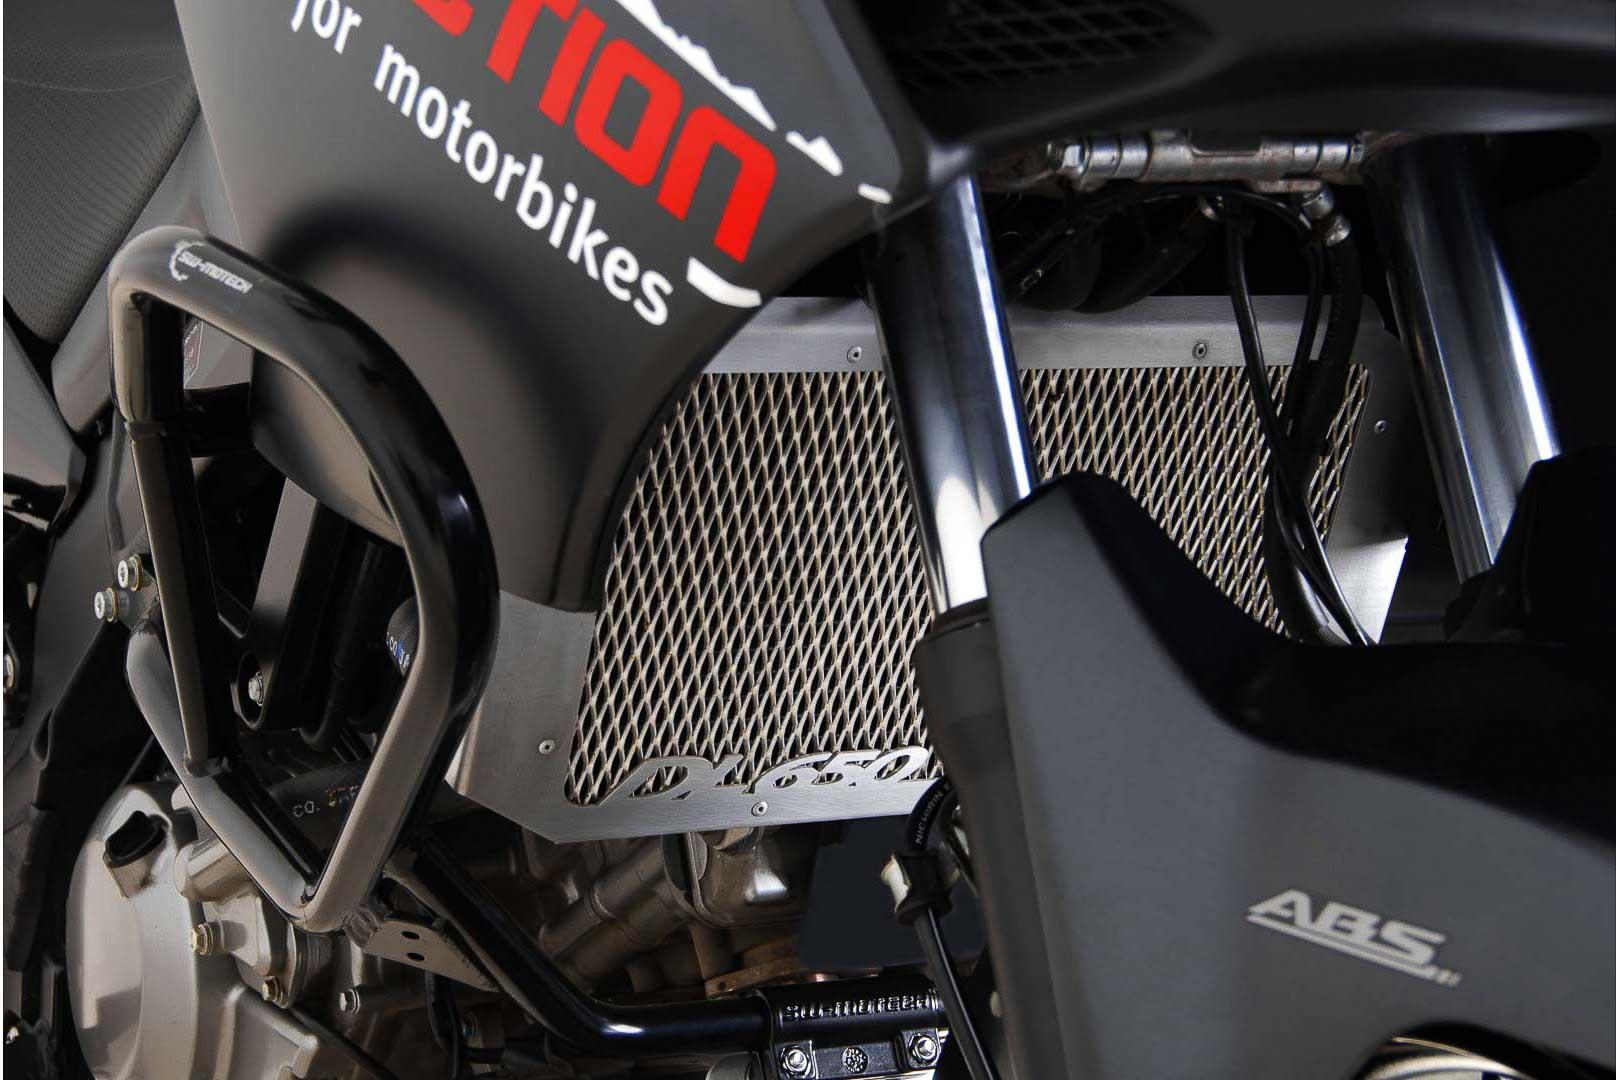 SW-Motech Jäähdyttimen suoja Suzuki DL650 V-Strom hopea